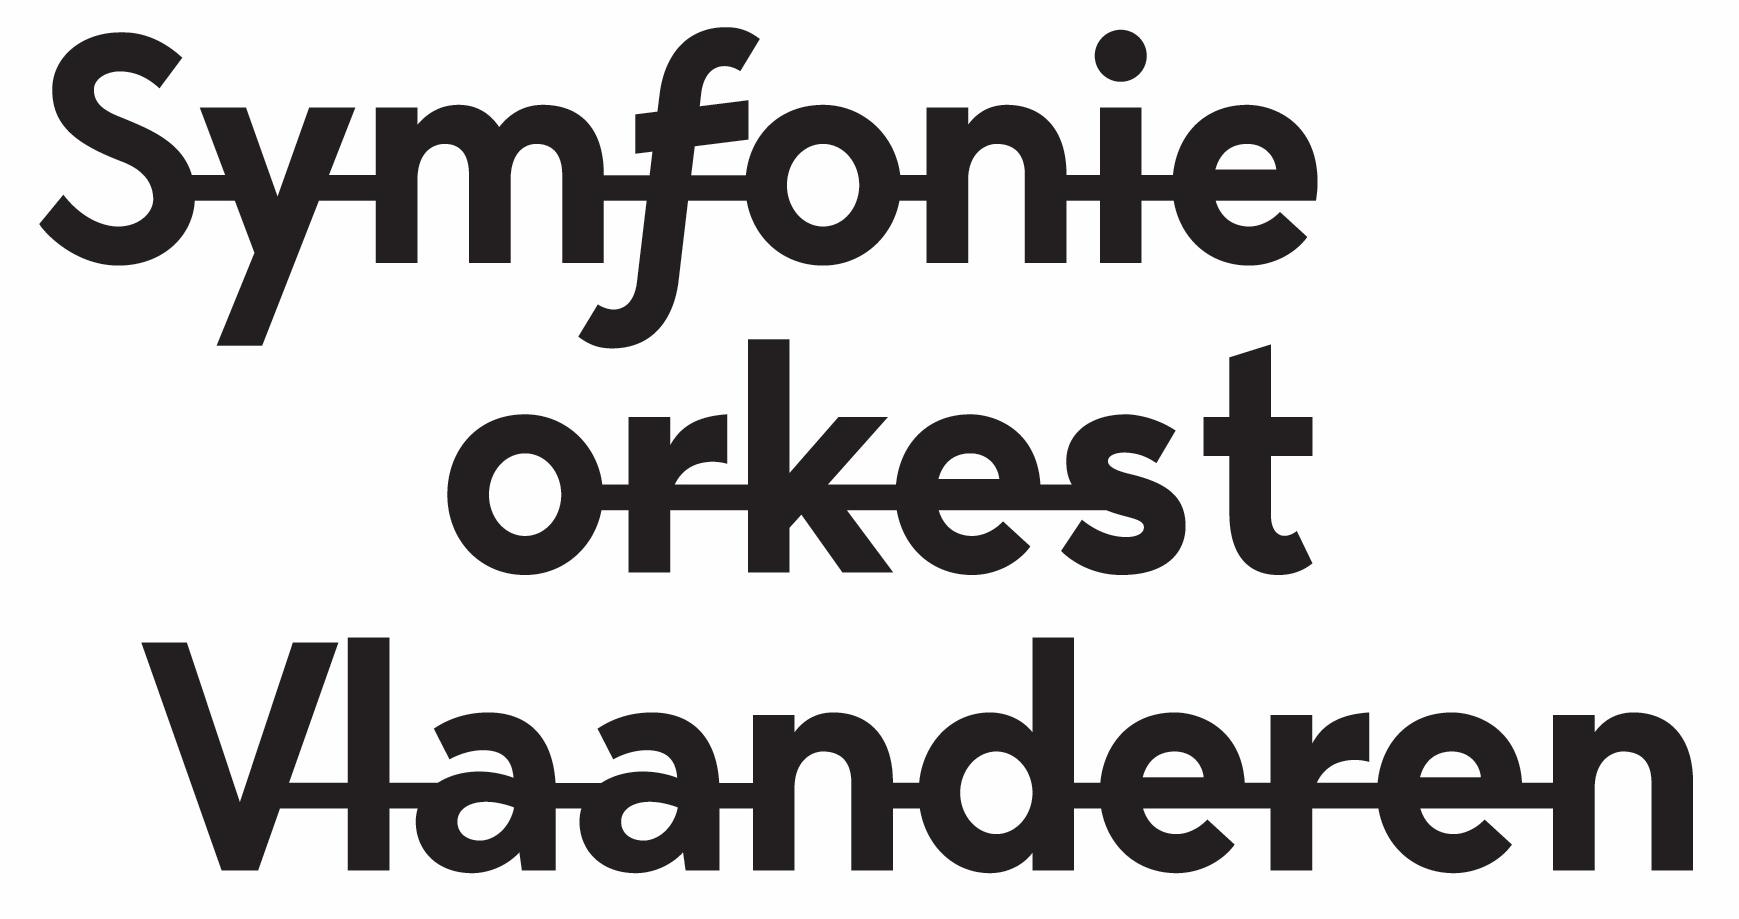 Symfonieorkest Vlaanderen